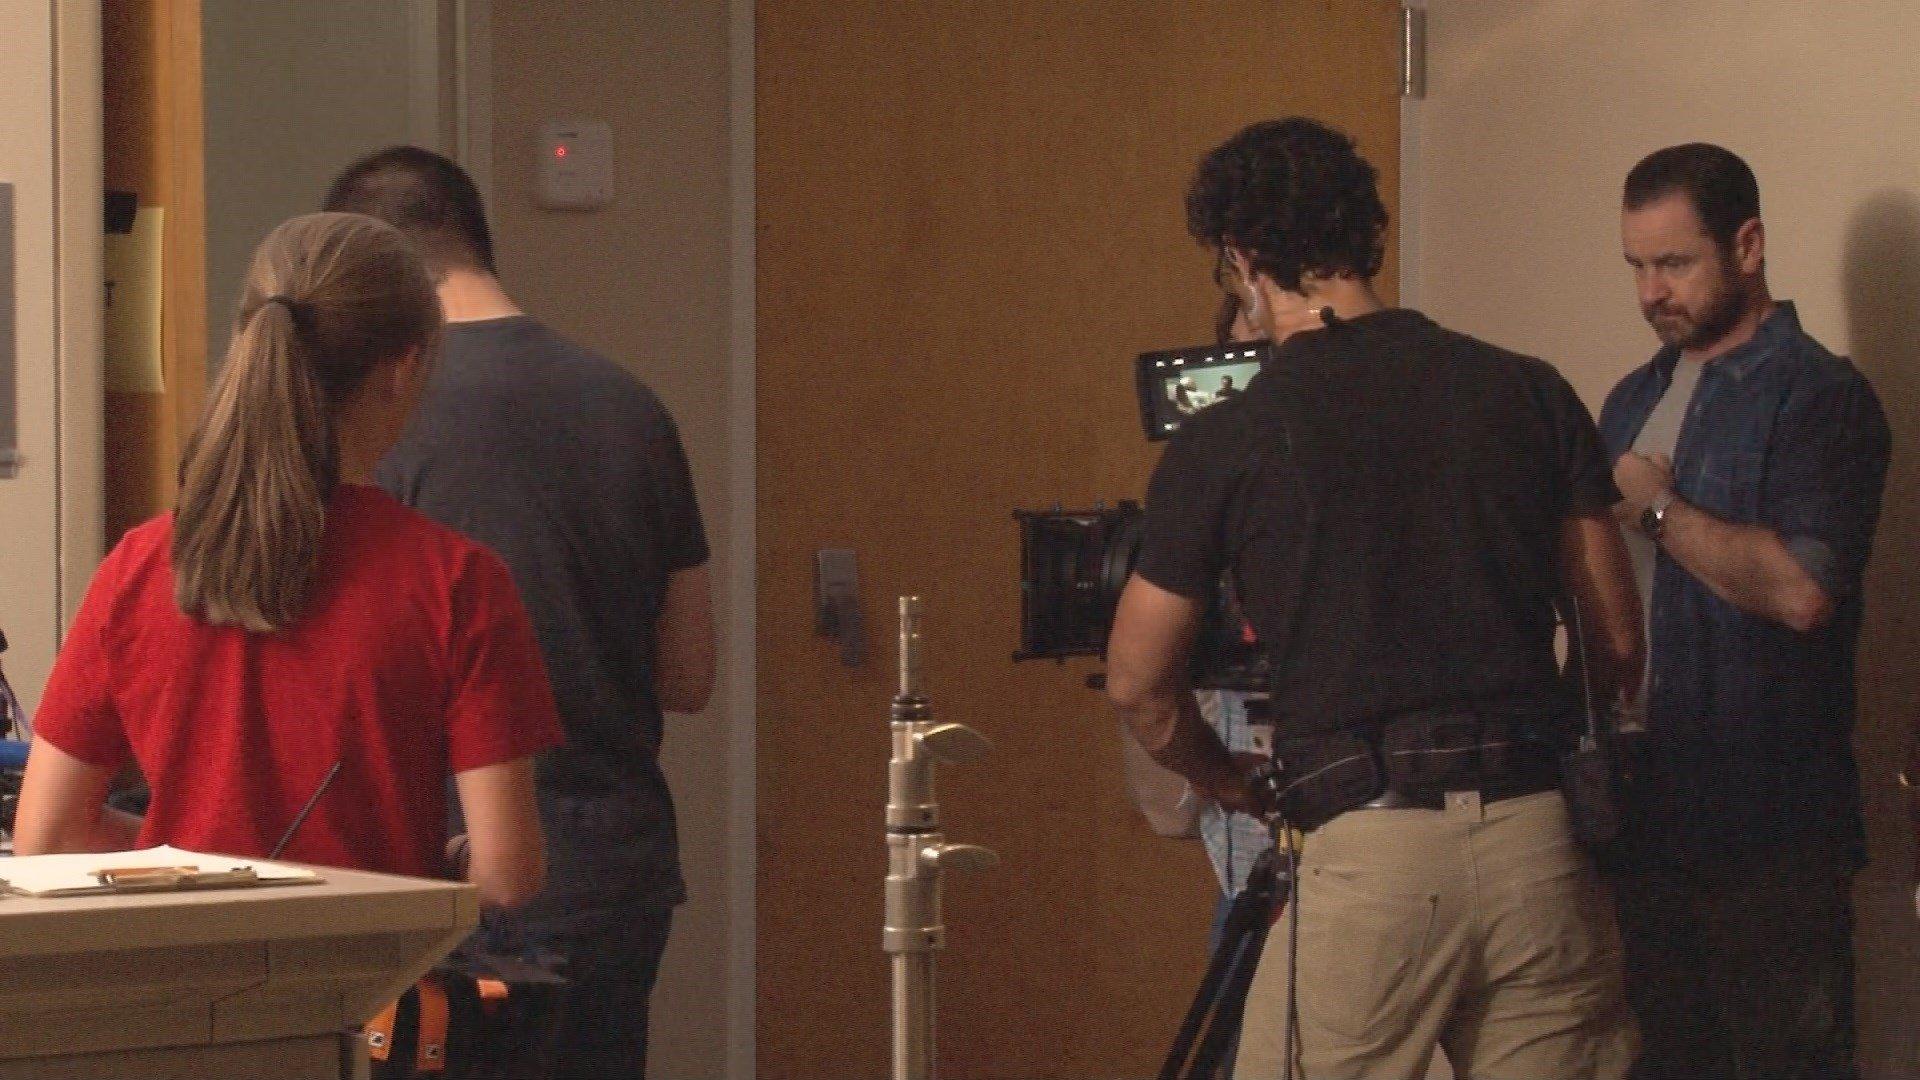 Sci-fi movie is being filmed in Augusta (WFXG)